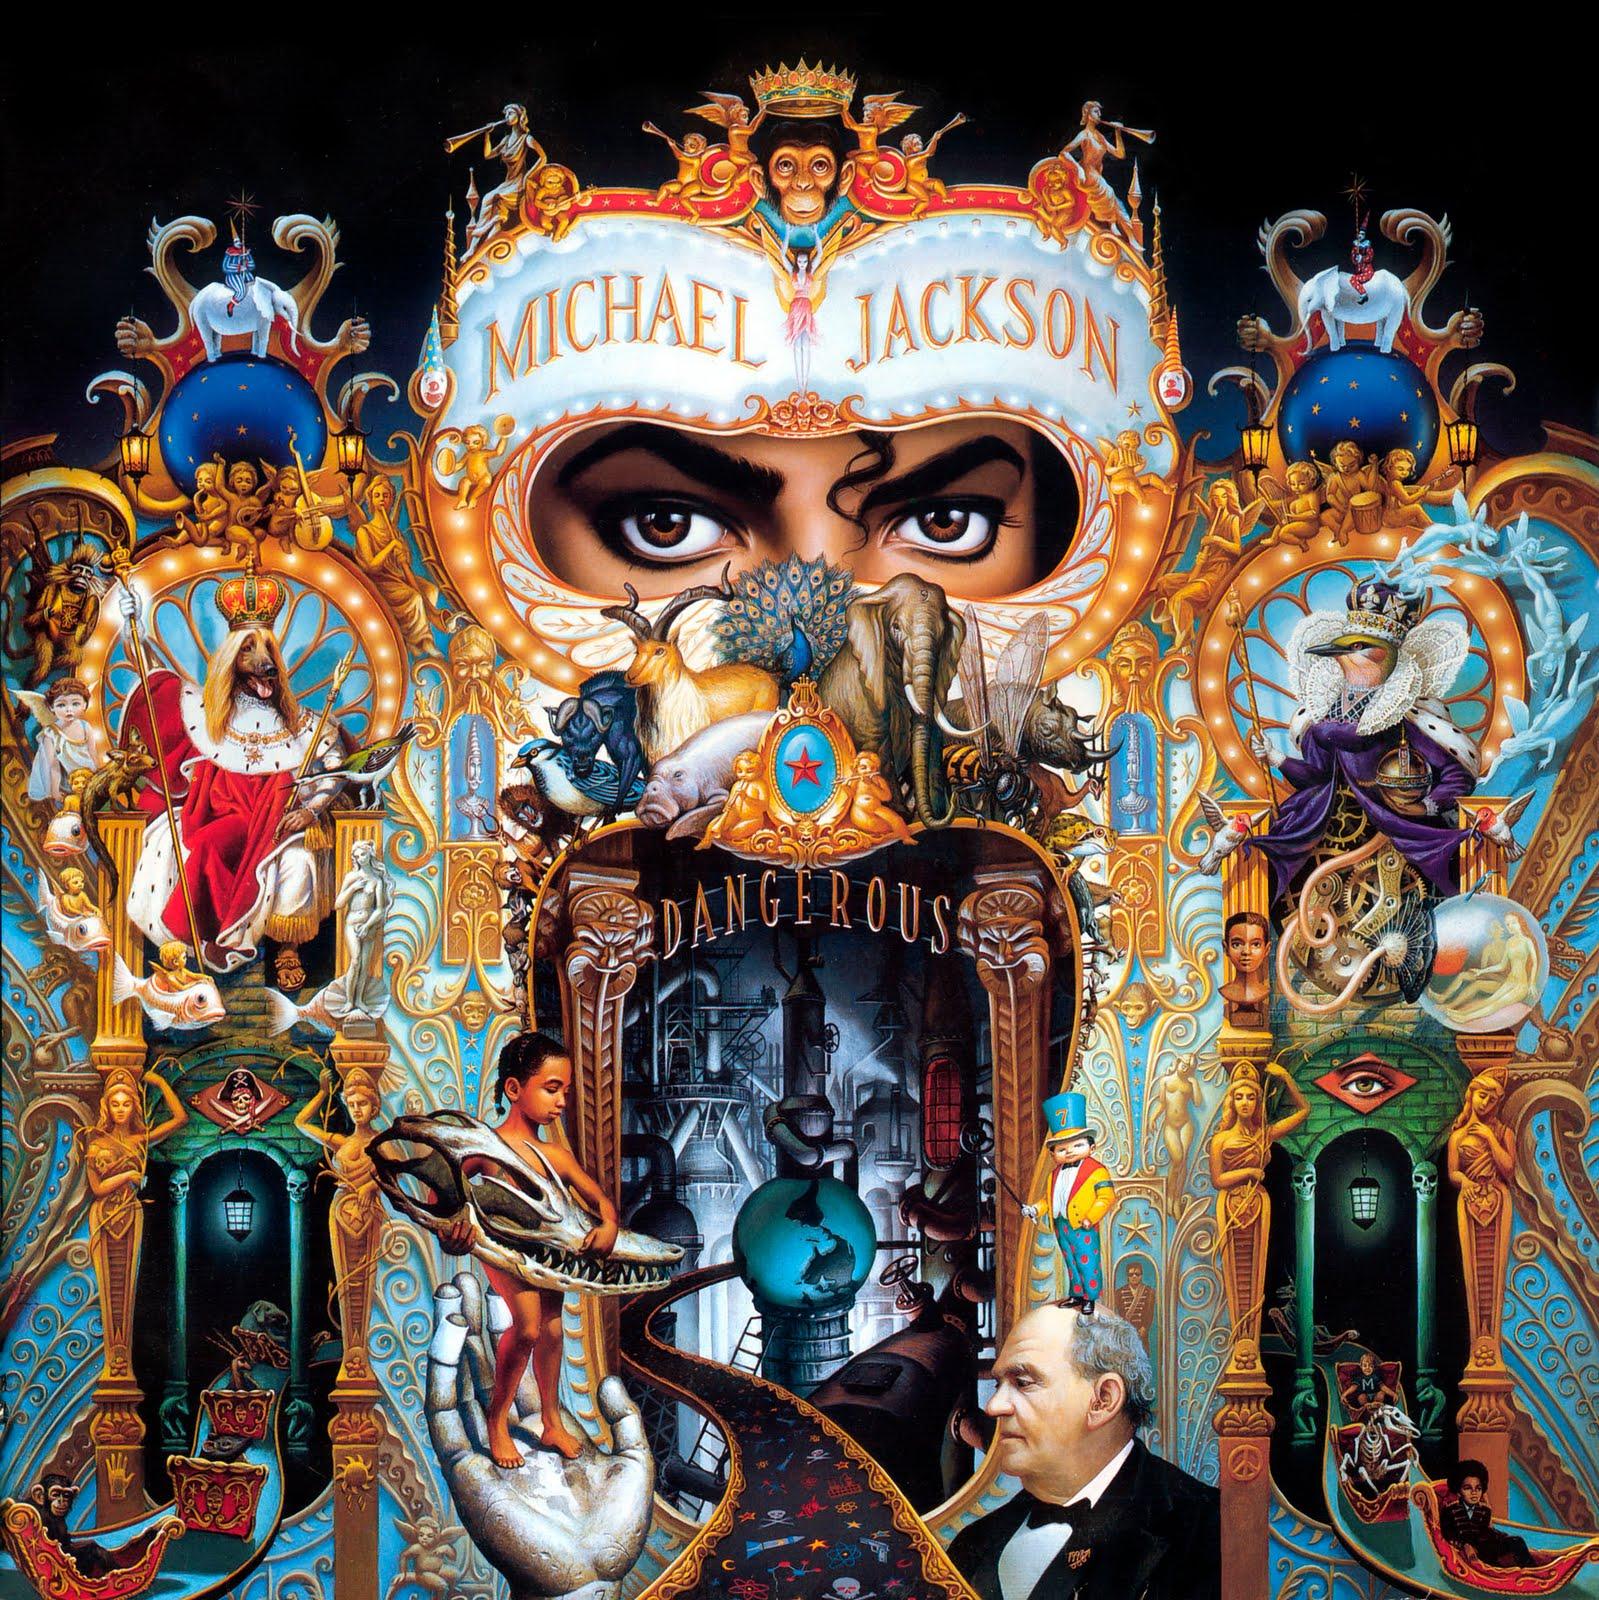 michael jackson album cover - photo #6